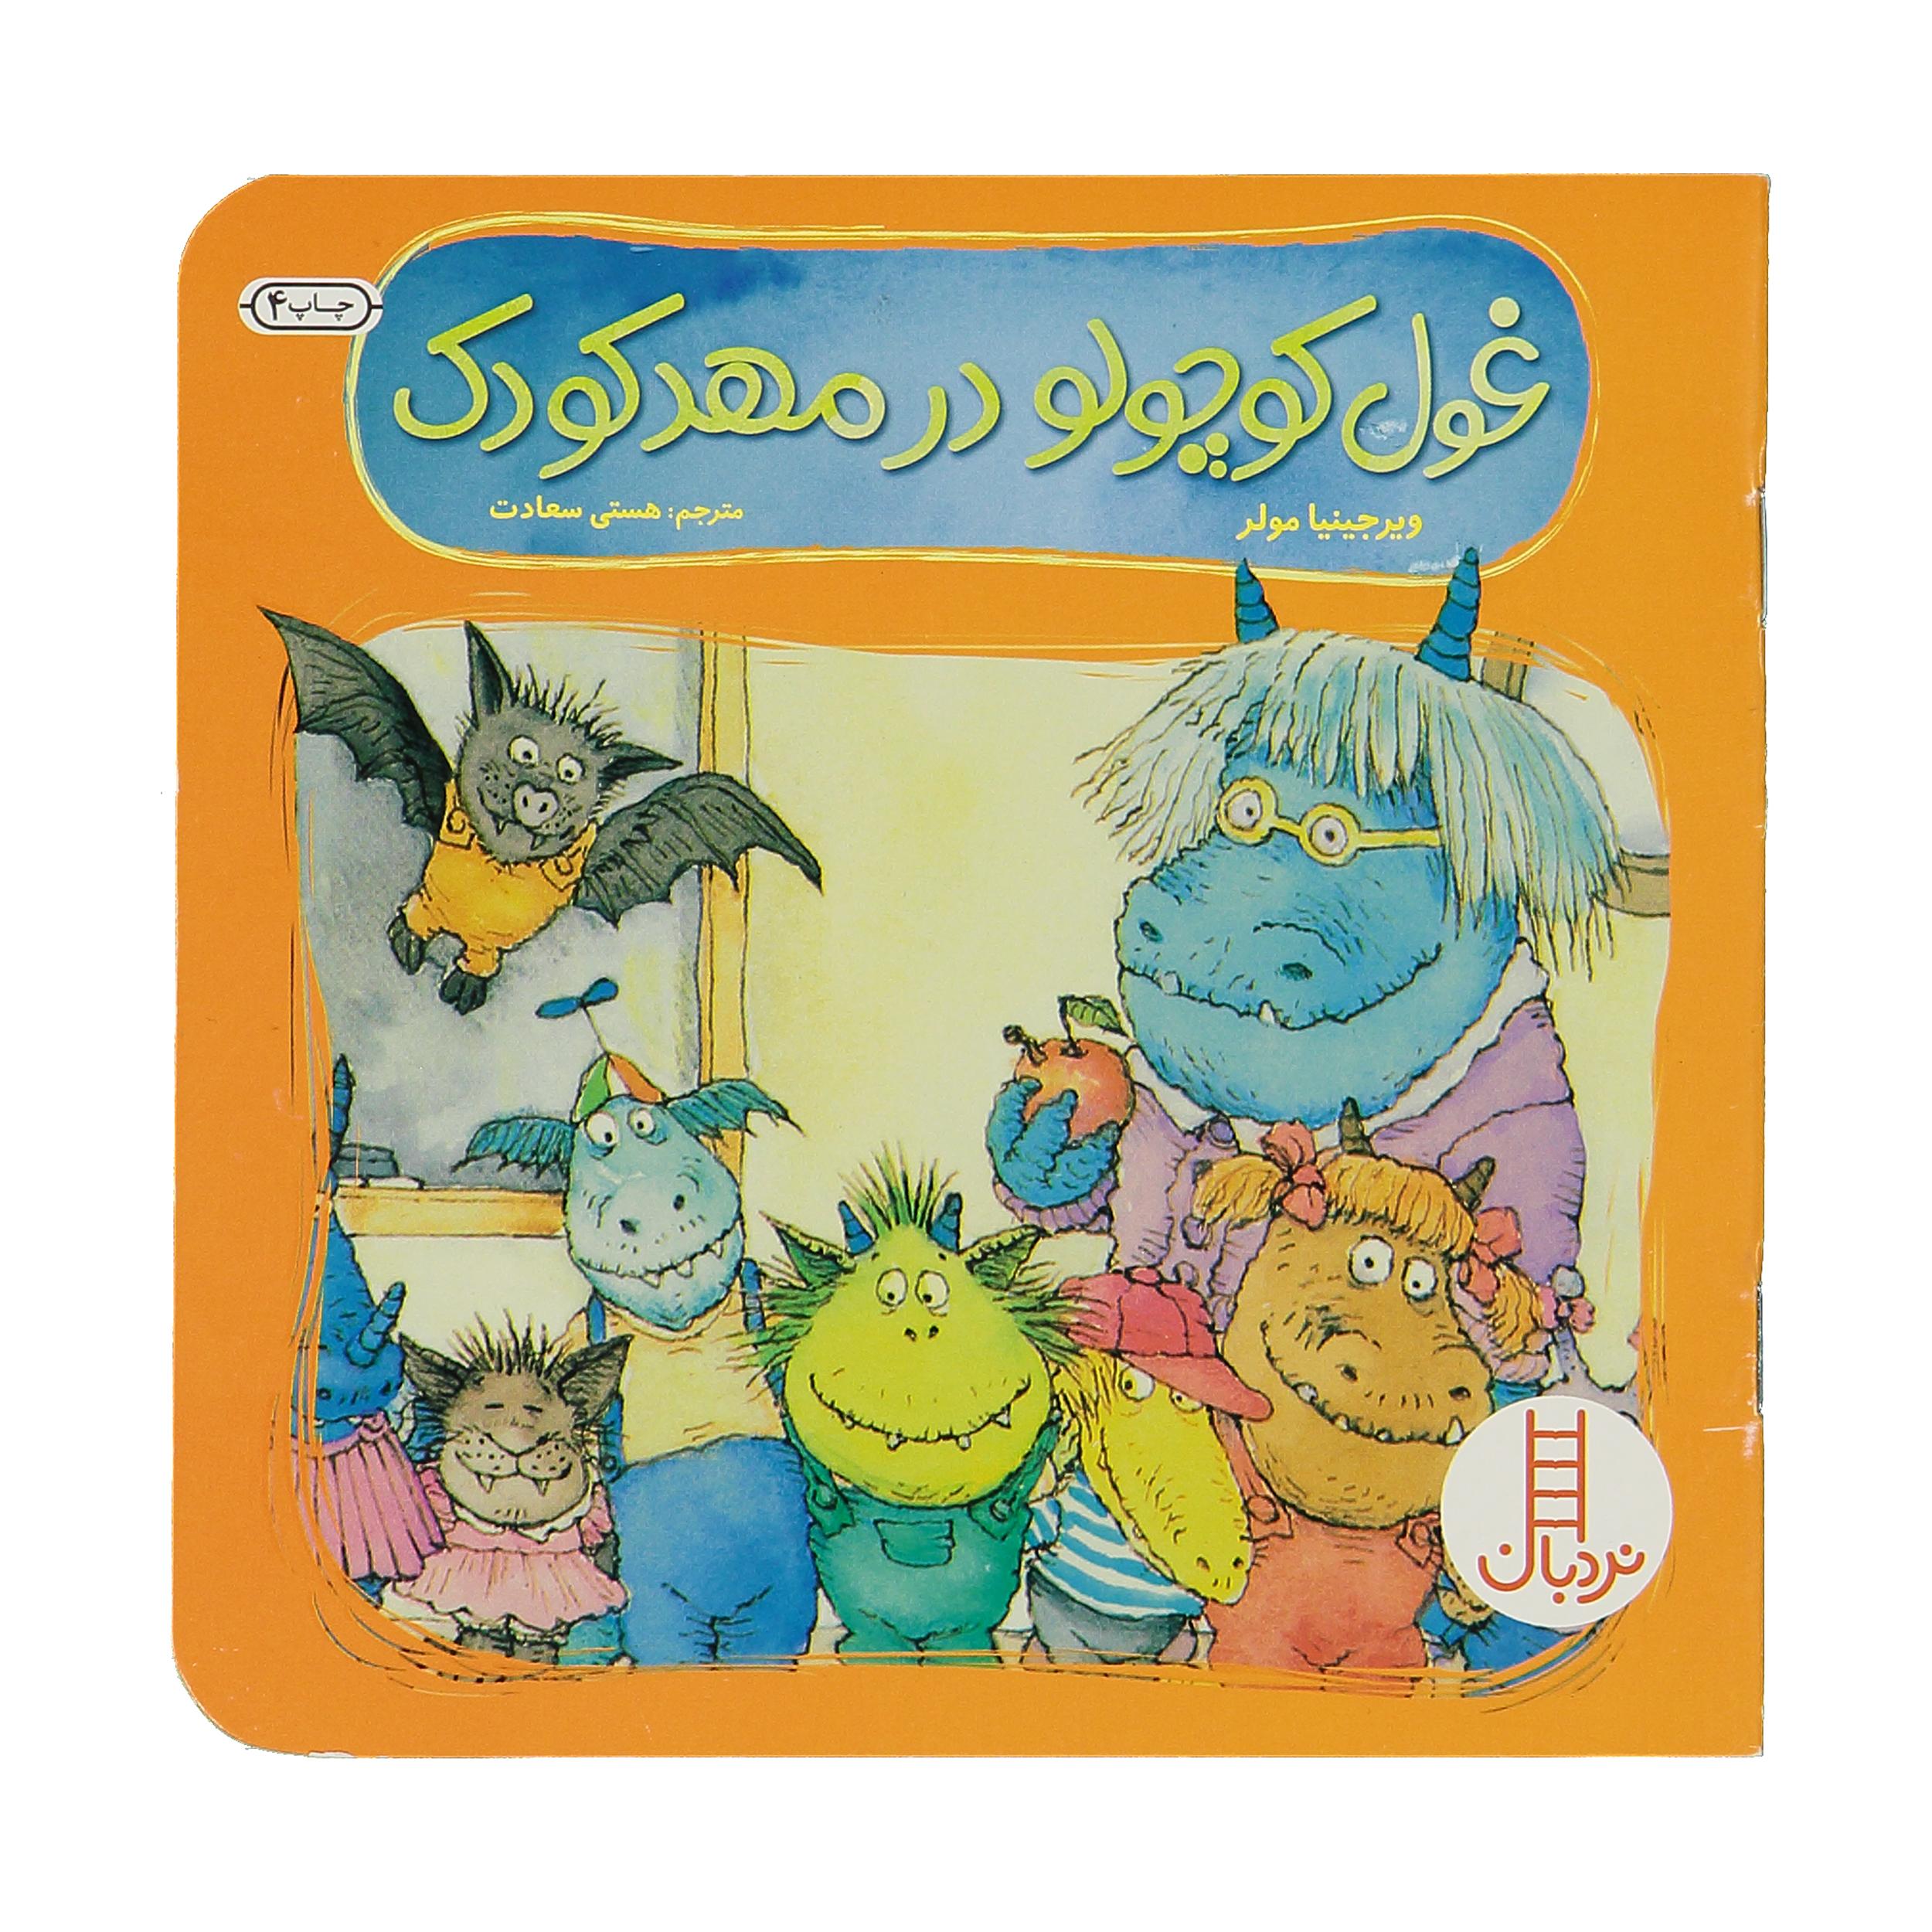 کتاب غول کوچولو در مهد کودک اثر ویرجینیا مولر